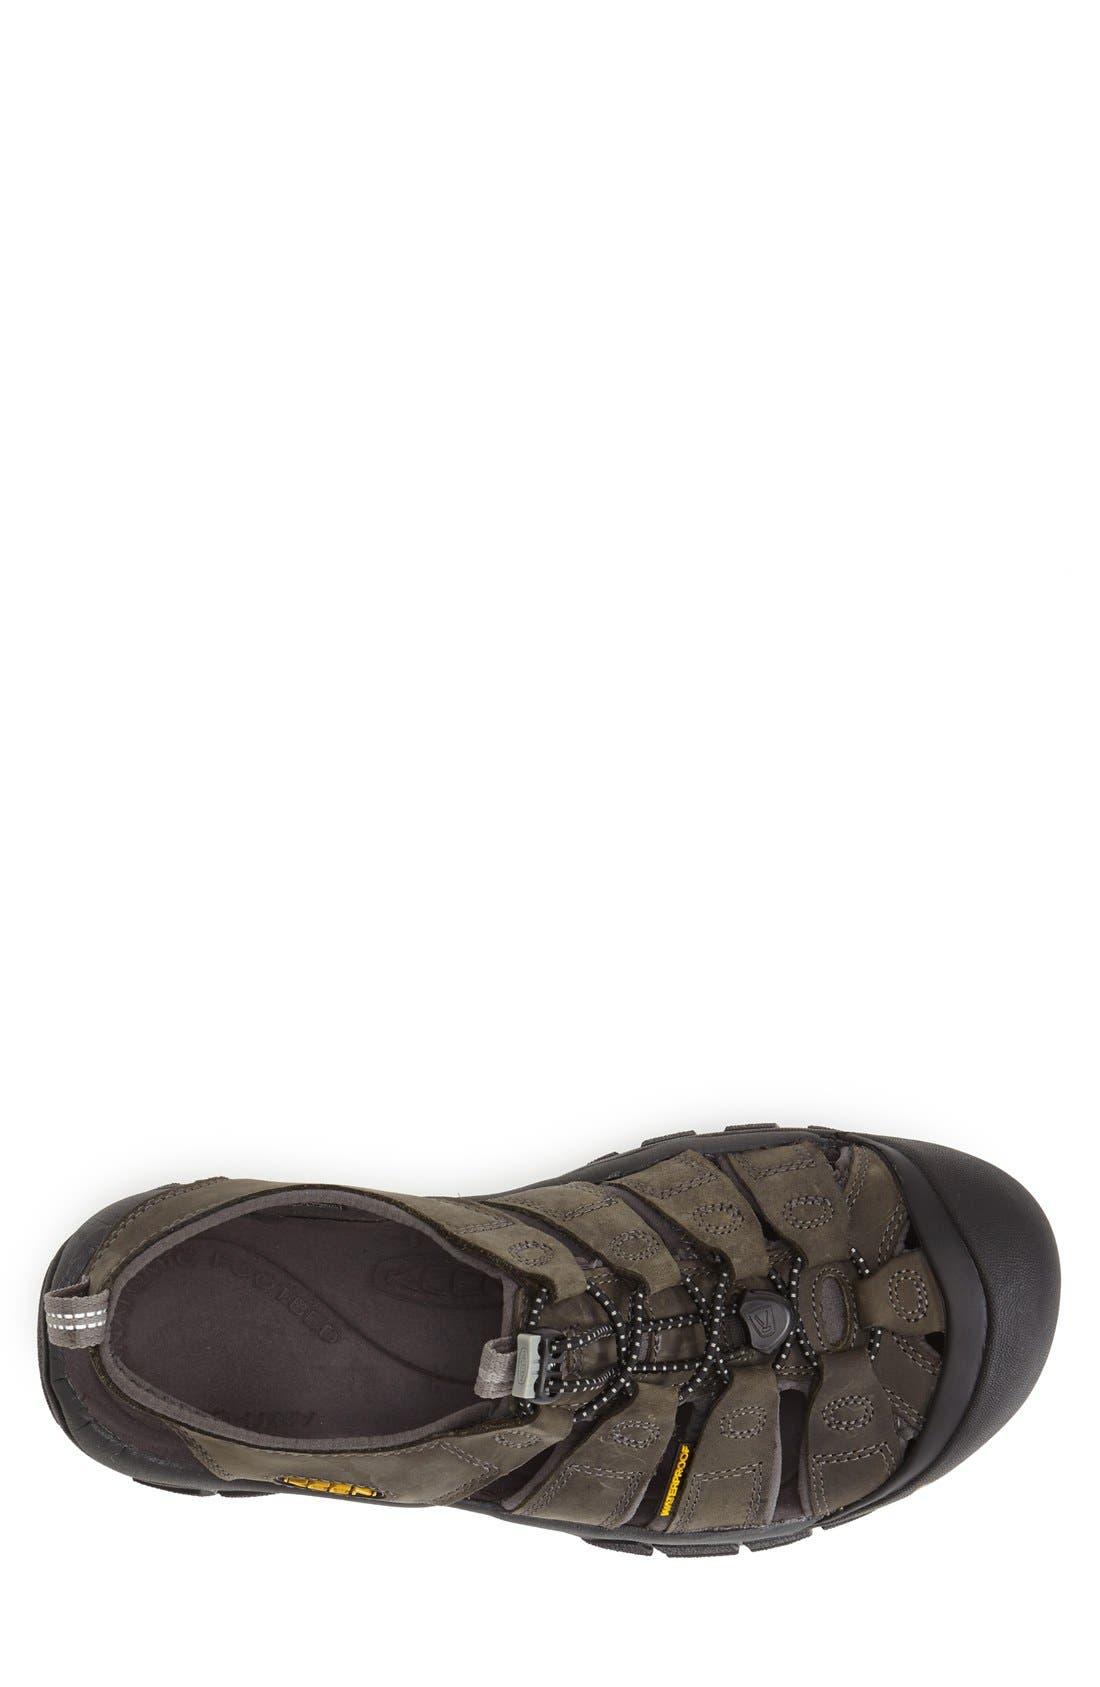 Alternate Image 3  - Keen 'Newport' Water Sandal (Men)